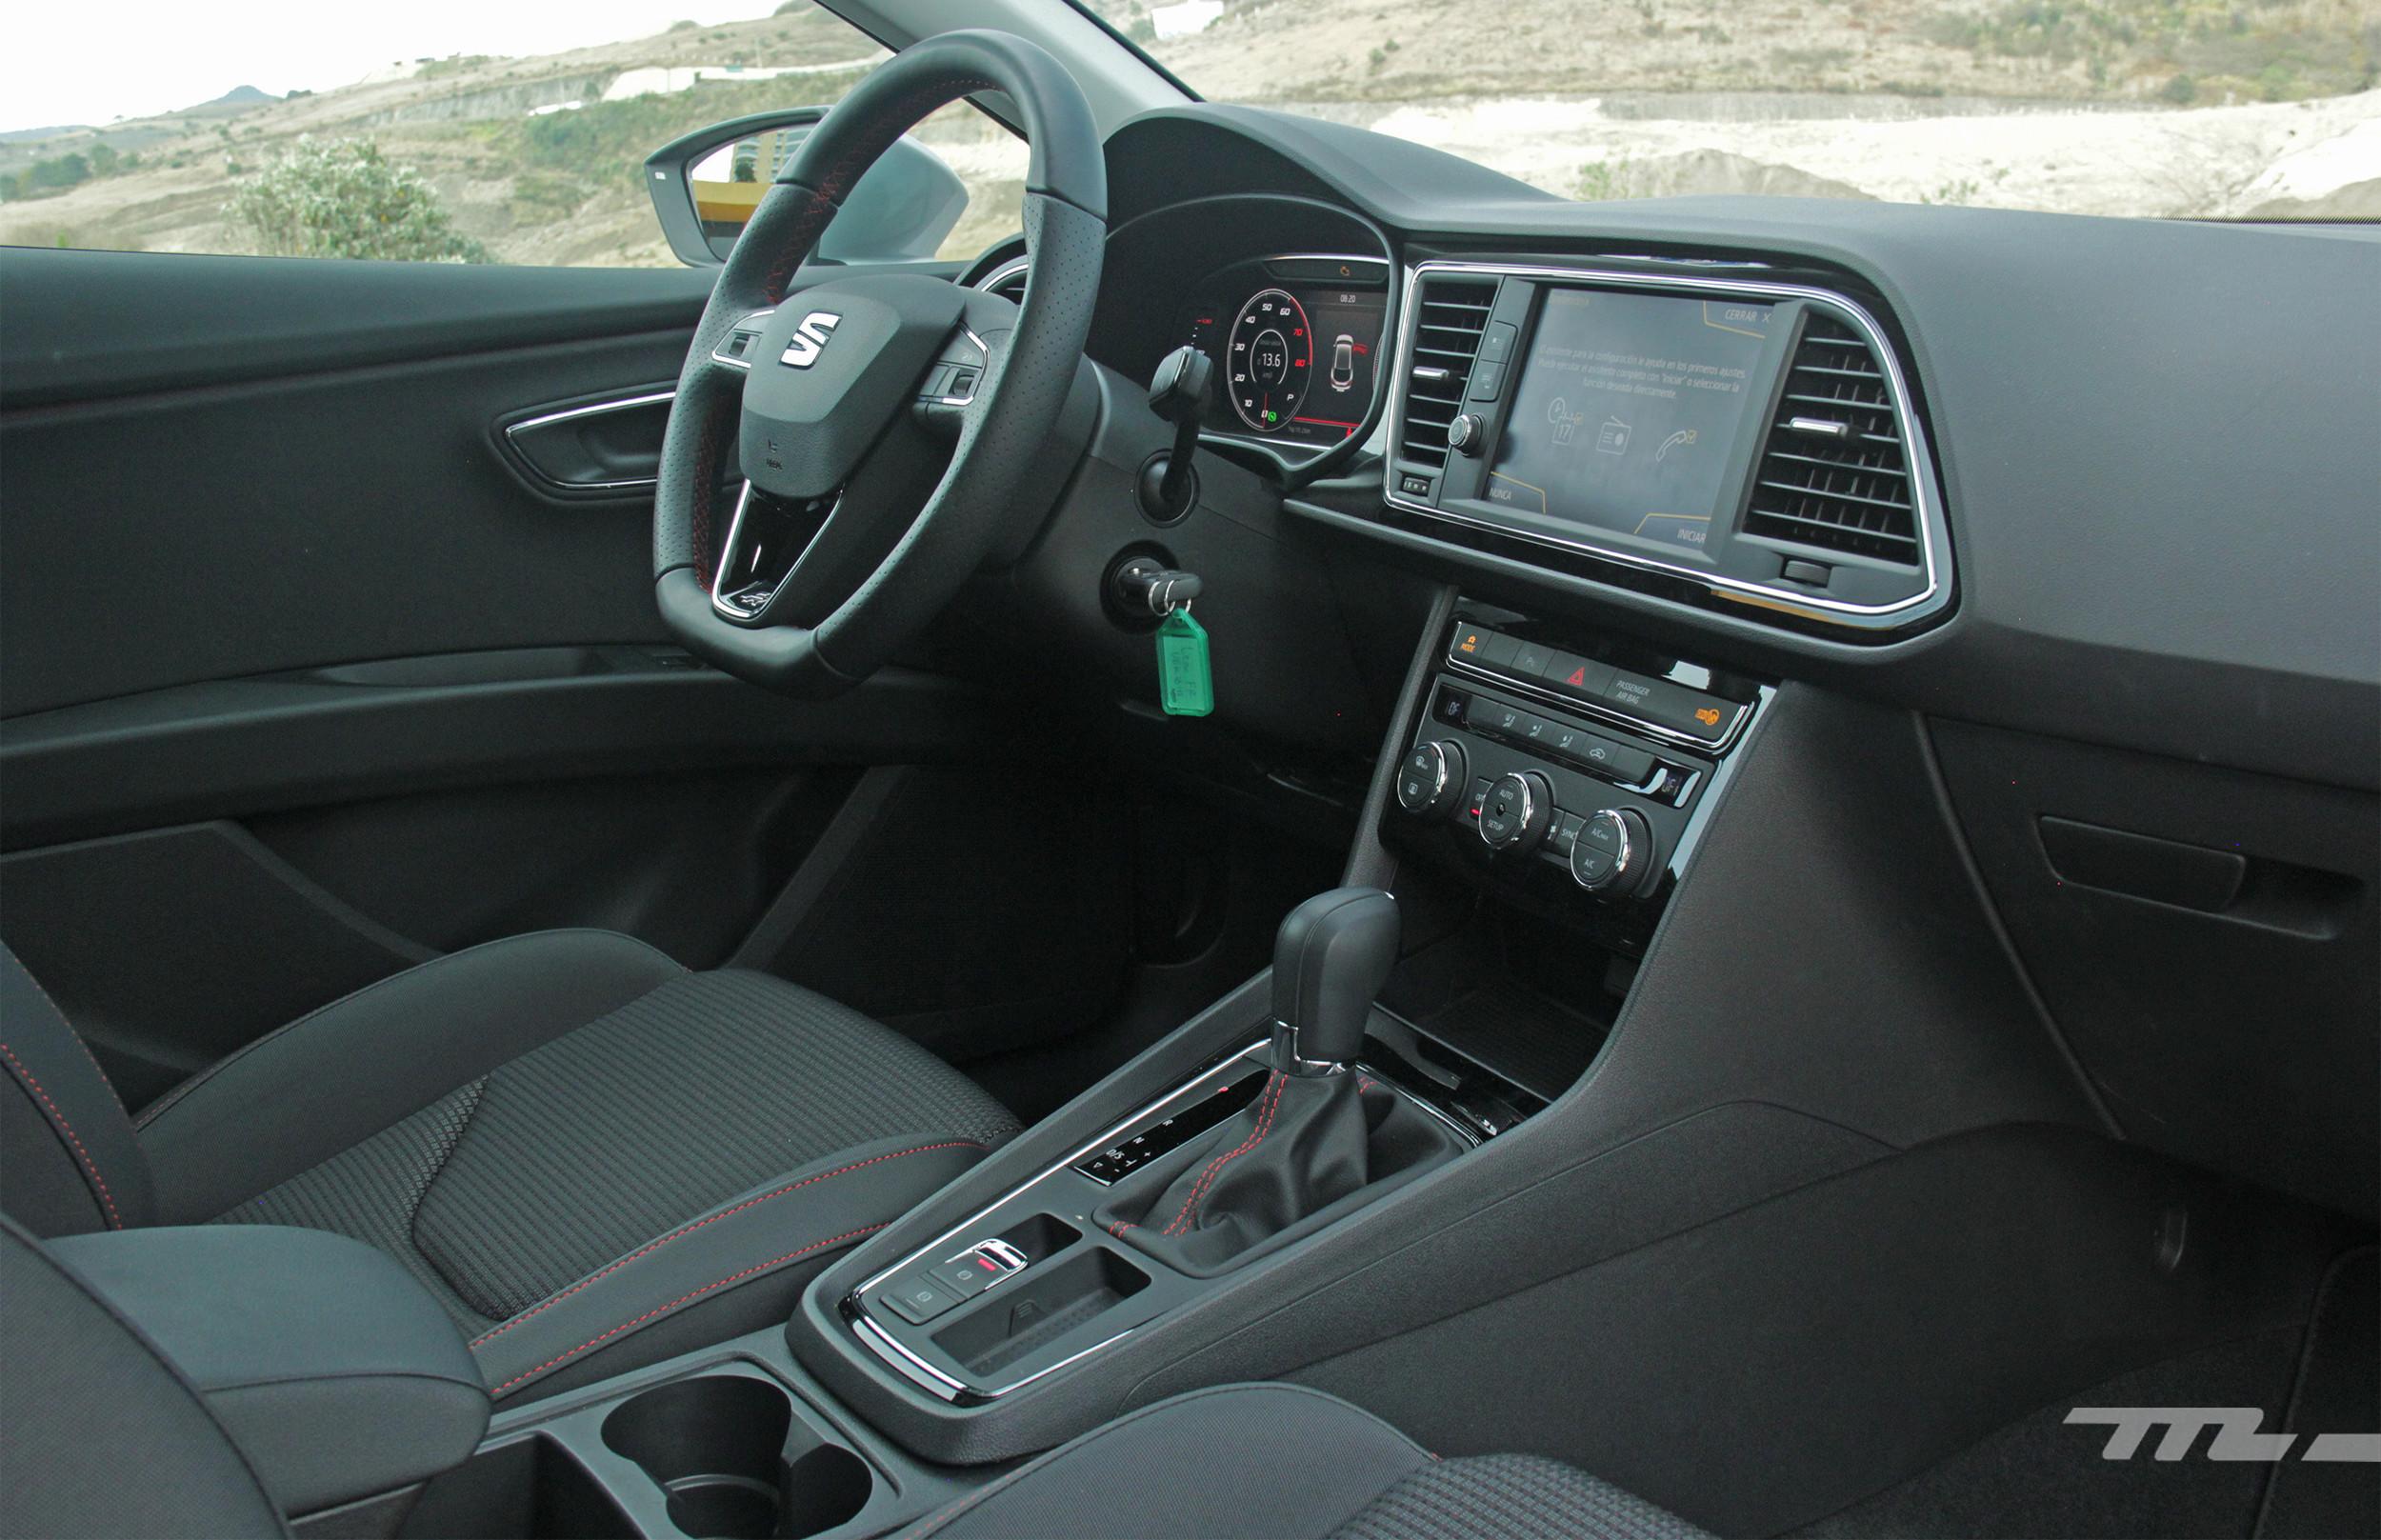 Foto de Mazda 3 vs. SEAT León (comparativa) (27/28)